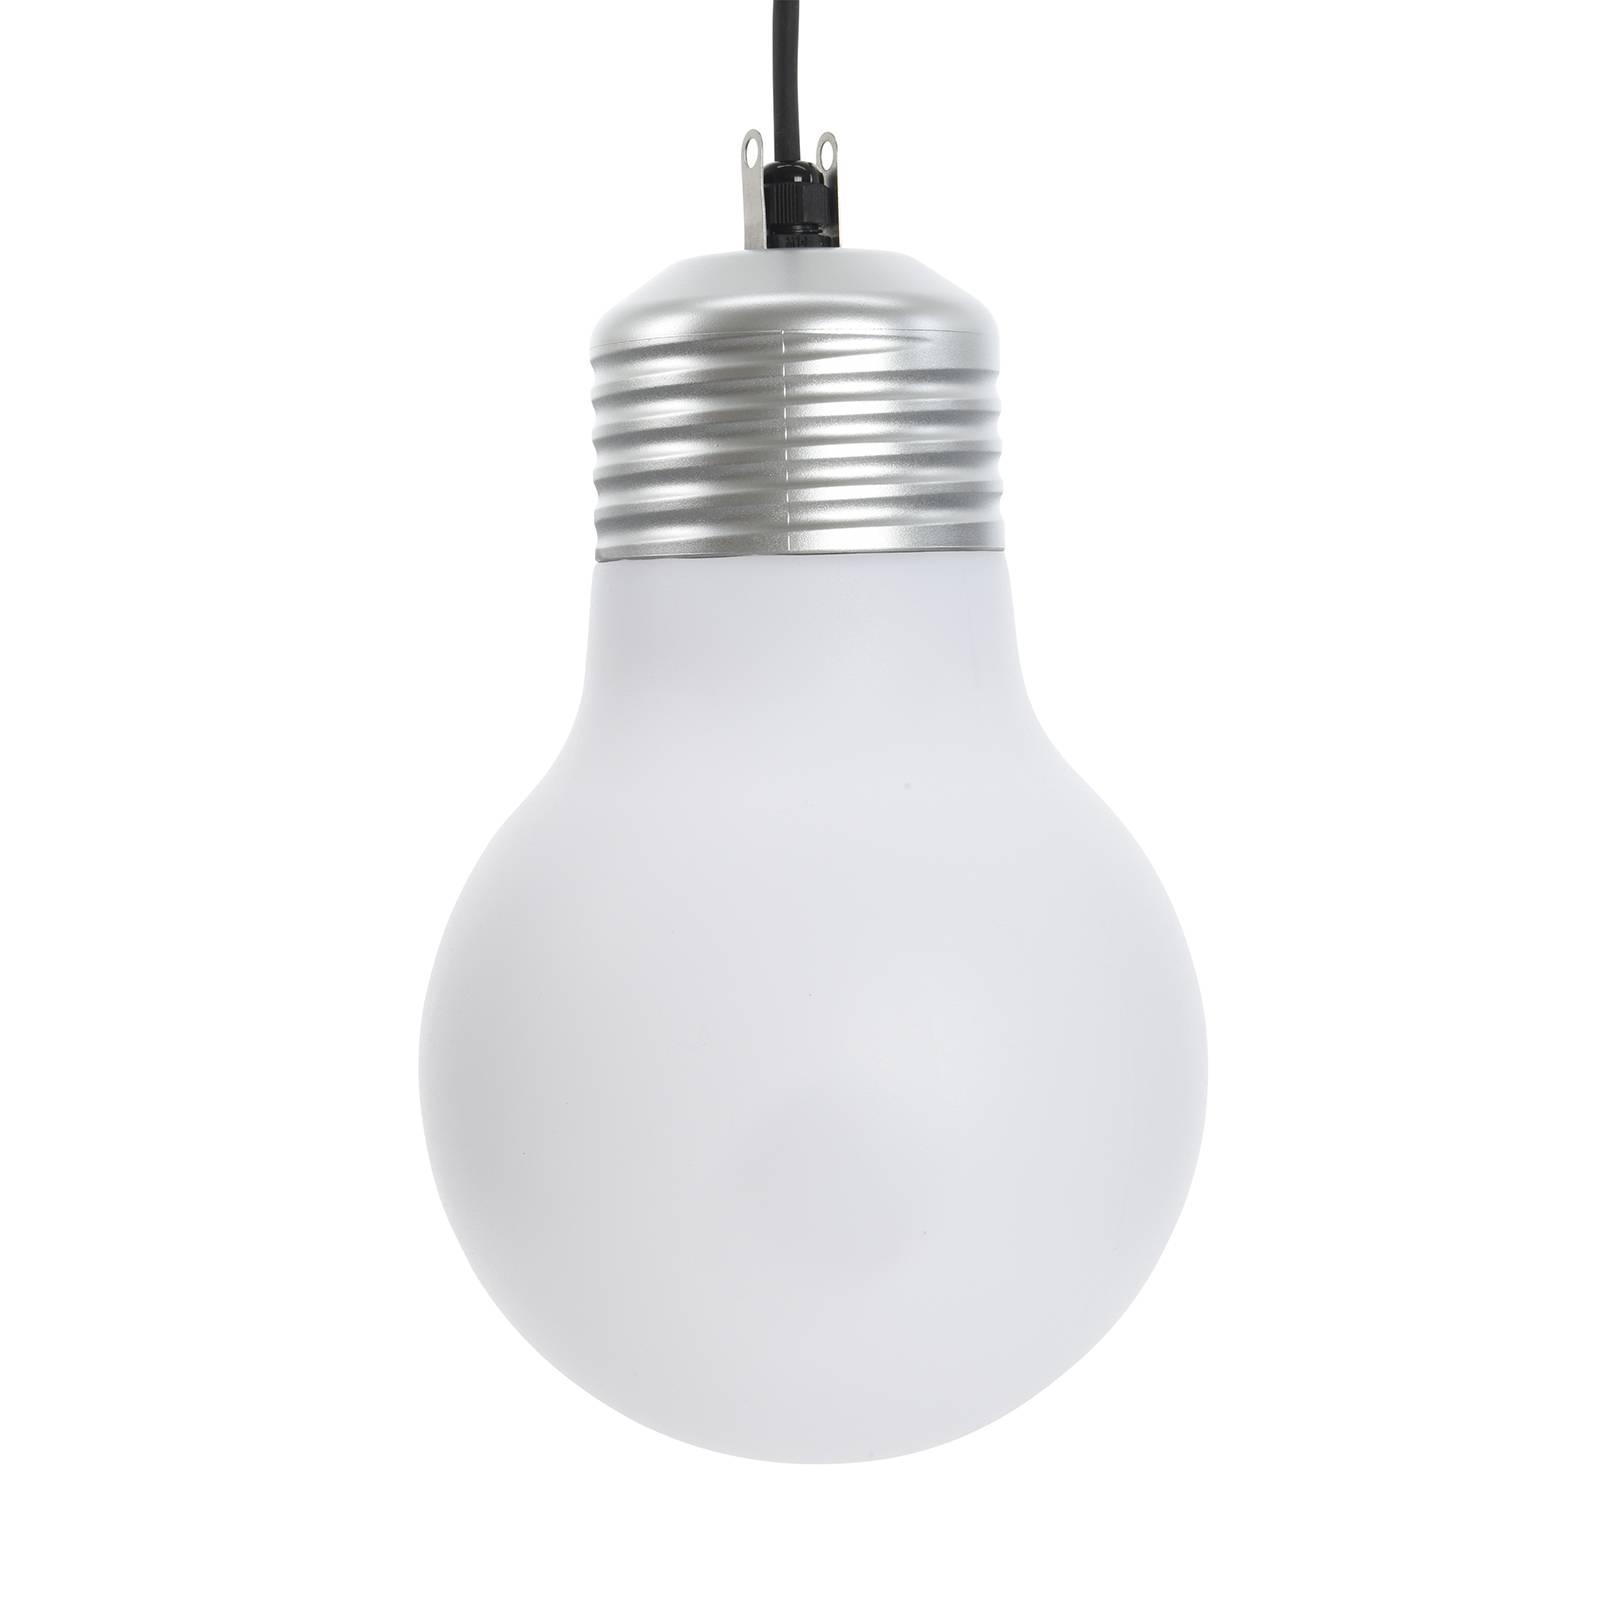 LED-riippuvalaisin 894576, IP65-suojaus